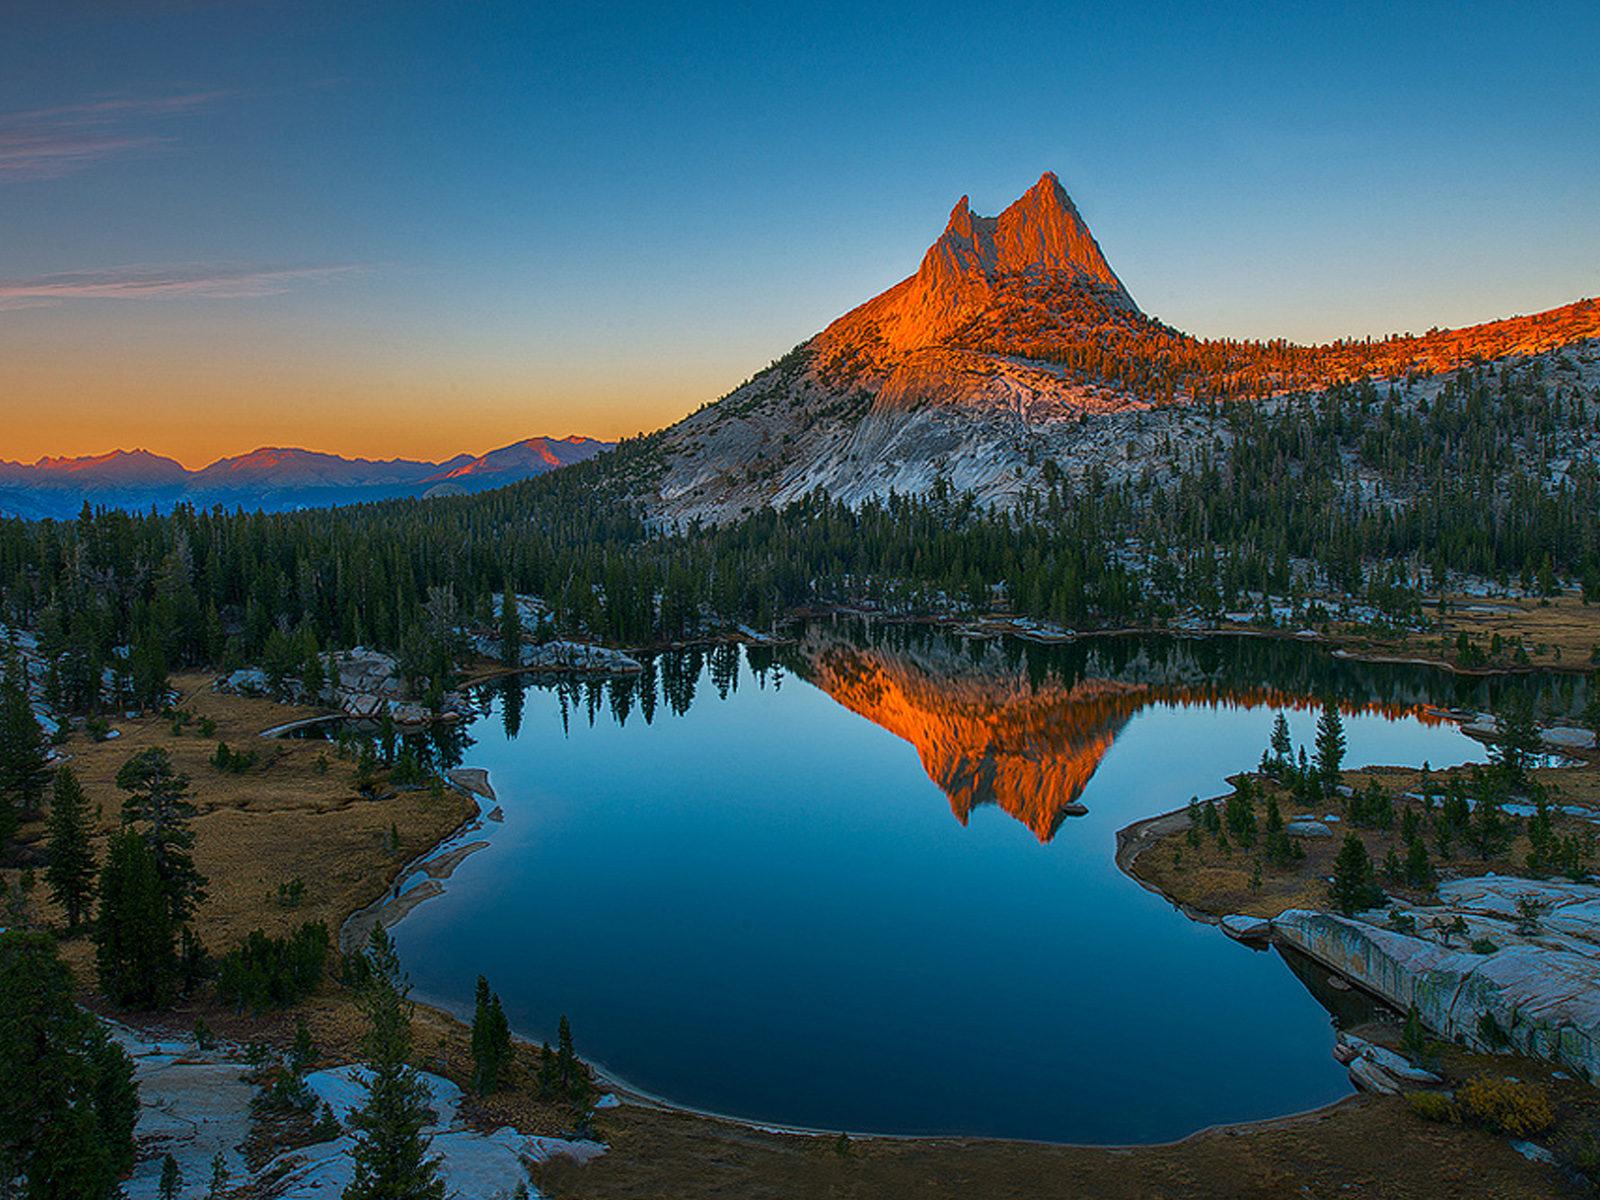 Sunset Mountain Rocky Mountain Top Lake Reflecting In Water Hd Desktop Wallpaper